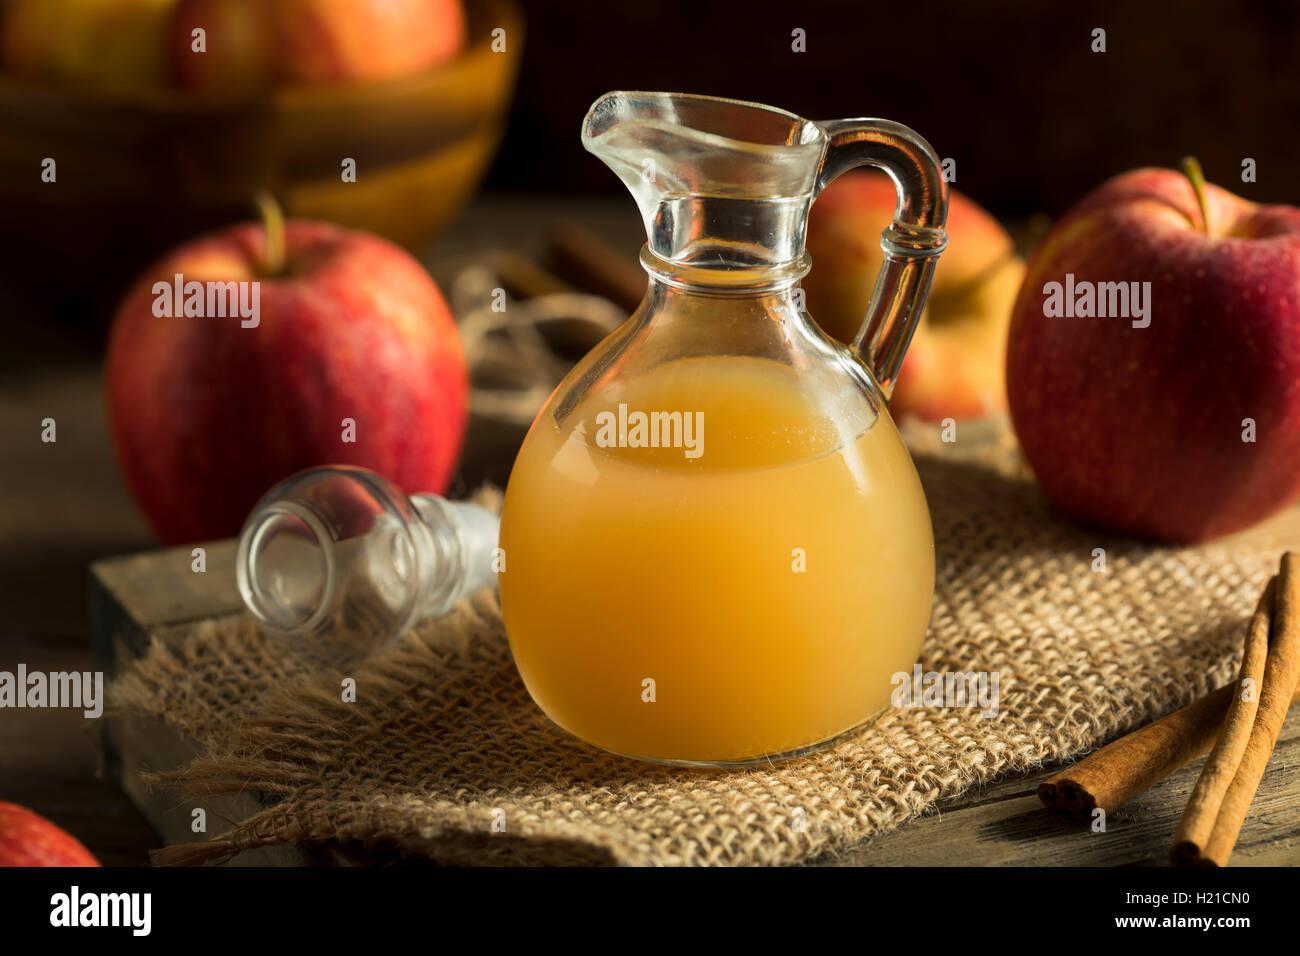 Raw Organic Apple Cider Vinegar in a Bottle - Stock Image